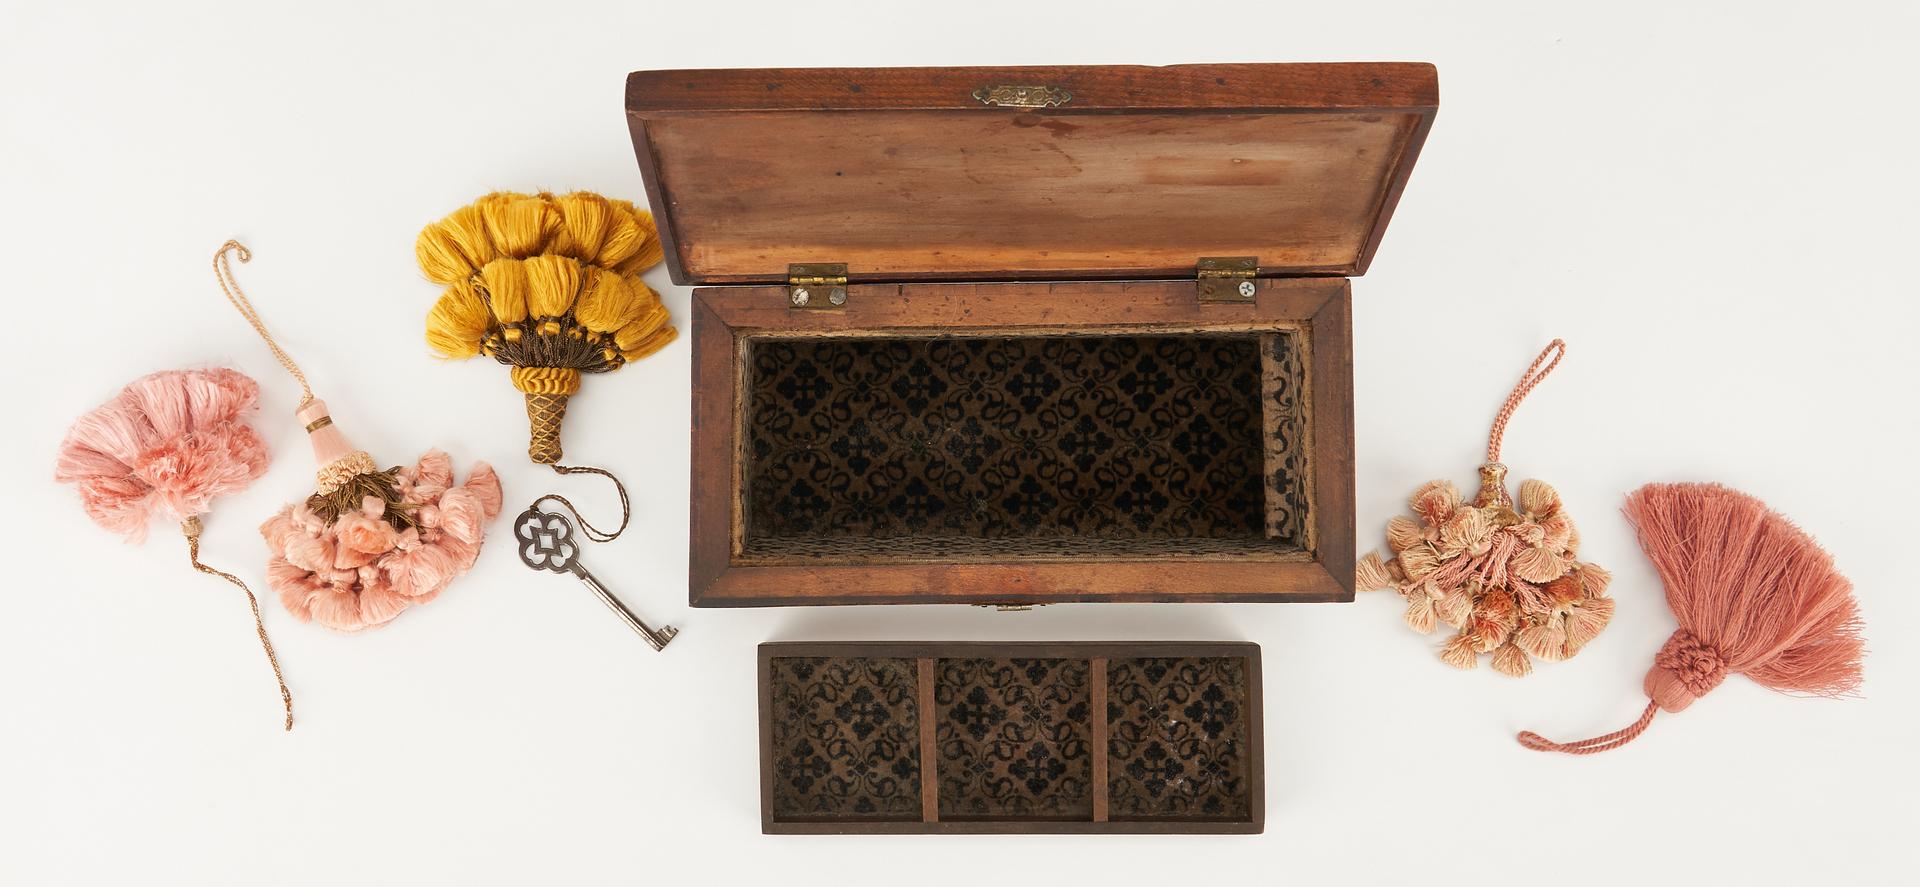 Lot 485: 2 Wooden Boxes, incl. Miniature Chest, Tea Caddy